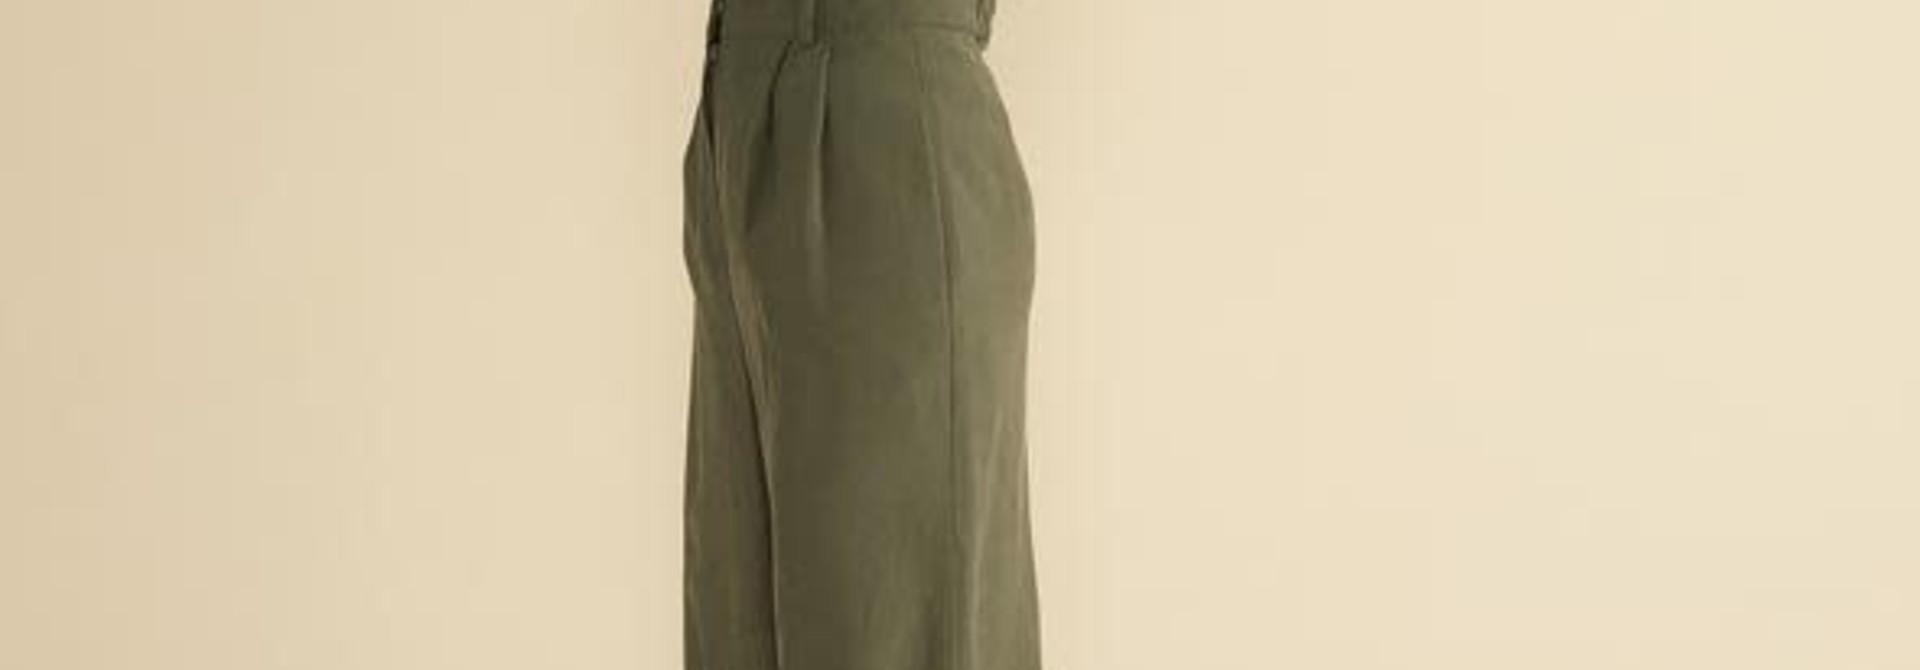 Harmony pants Oscar the collection